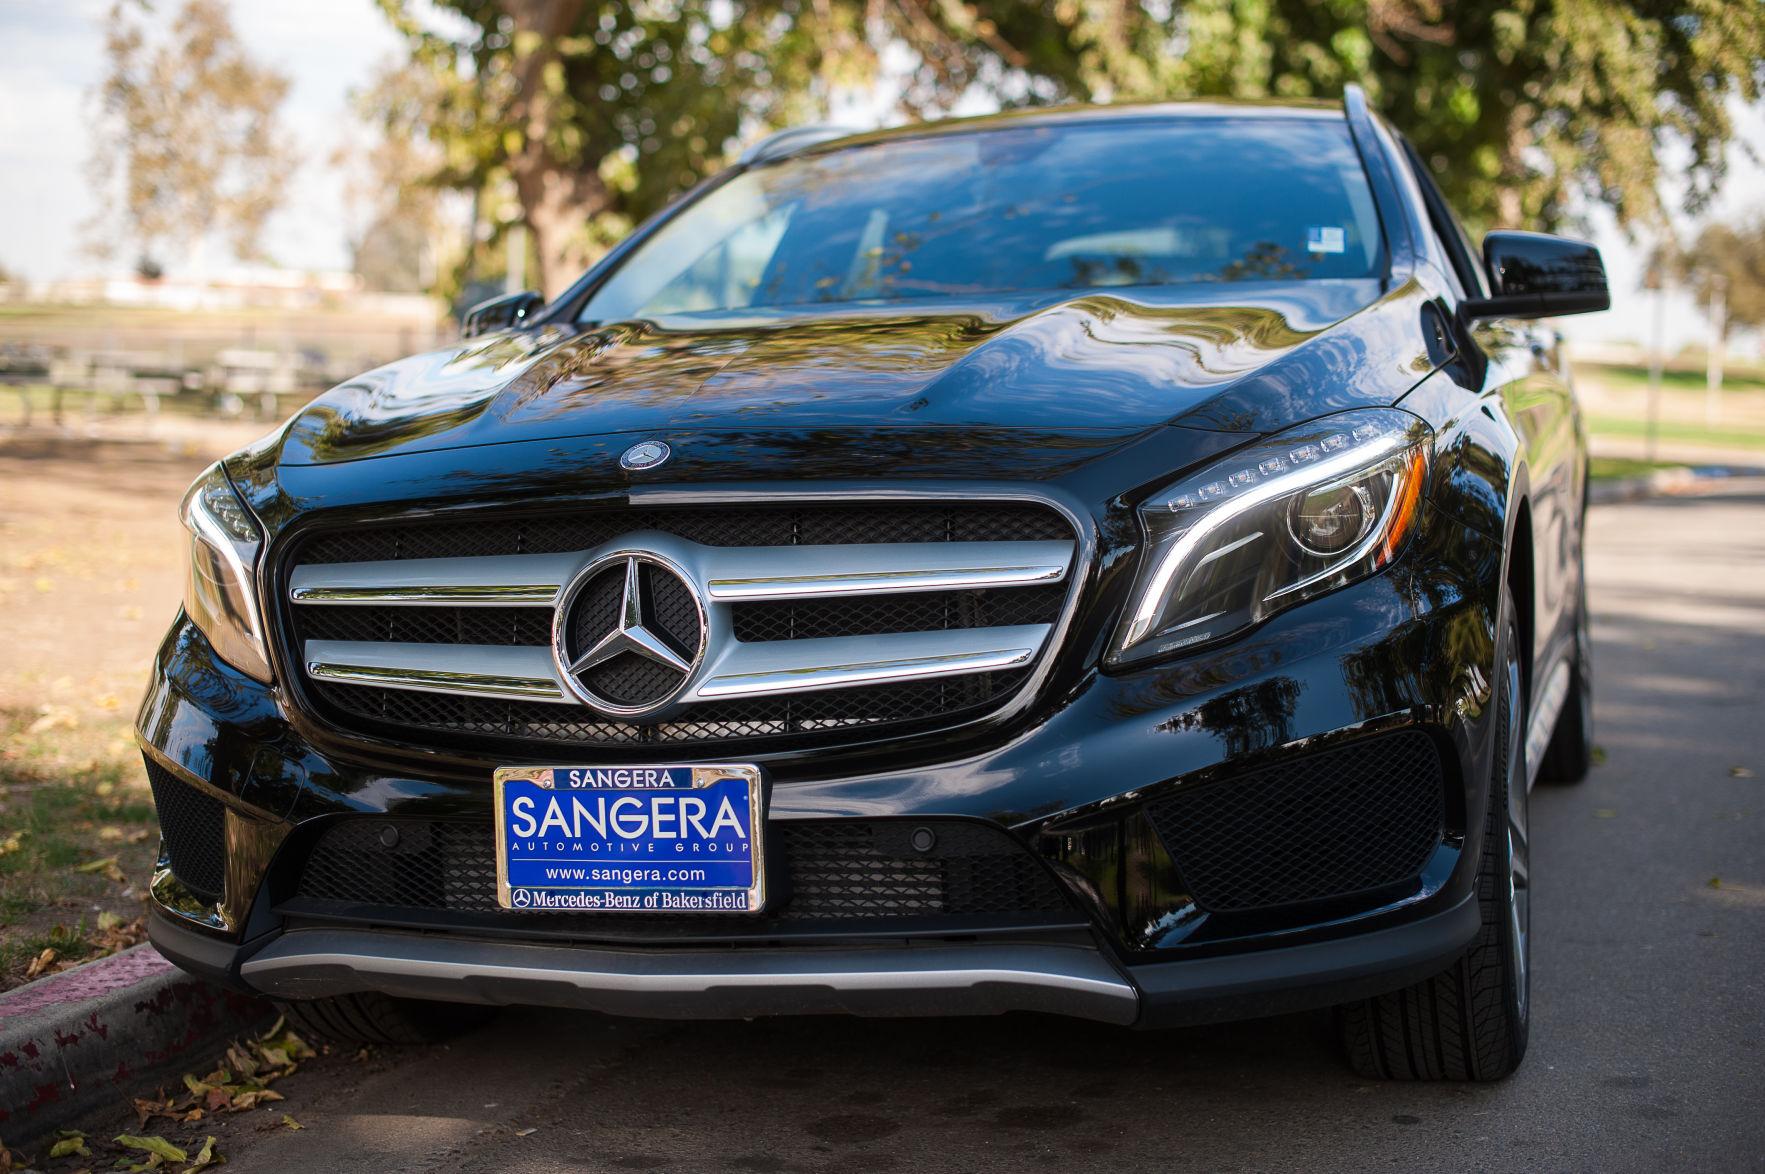 On The Road: 2015 Mercedes Benz GLA 250 | Bakersfield Life | Bakersfield.com